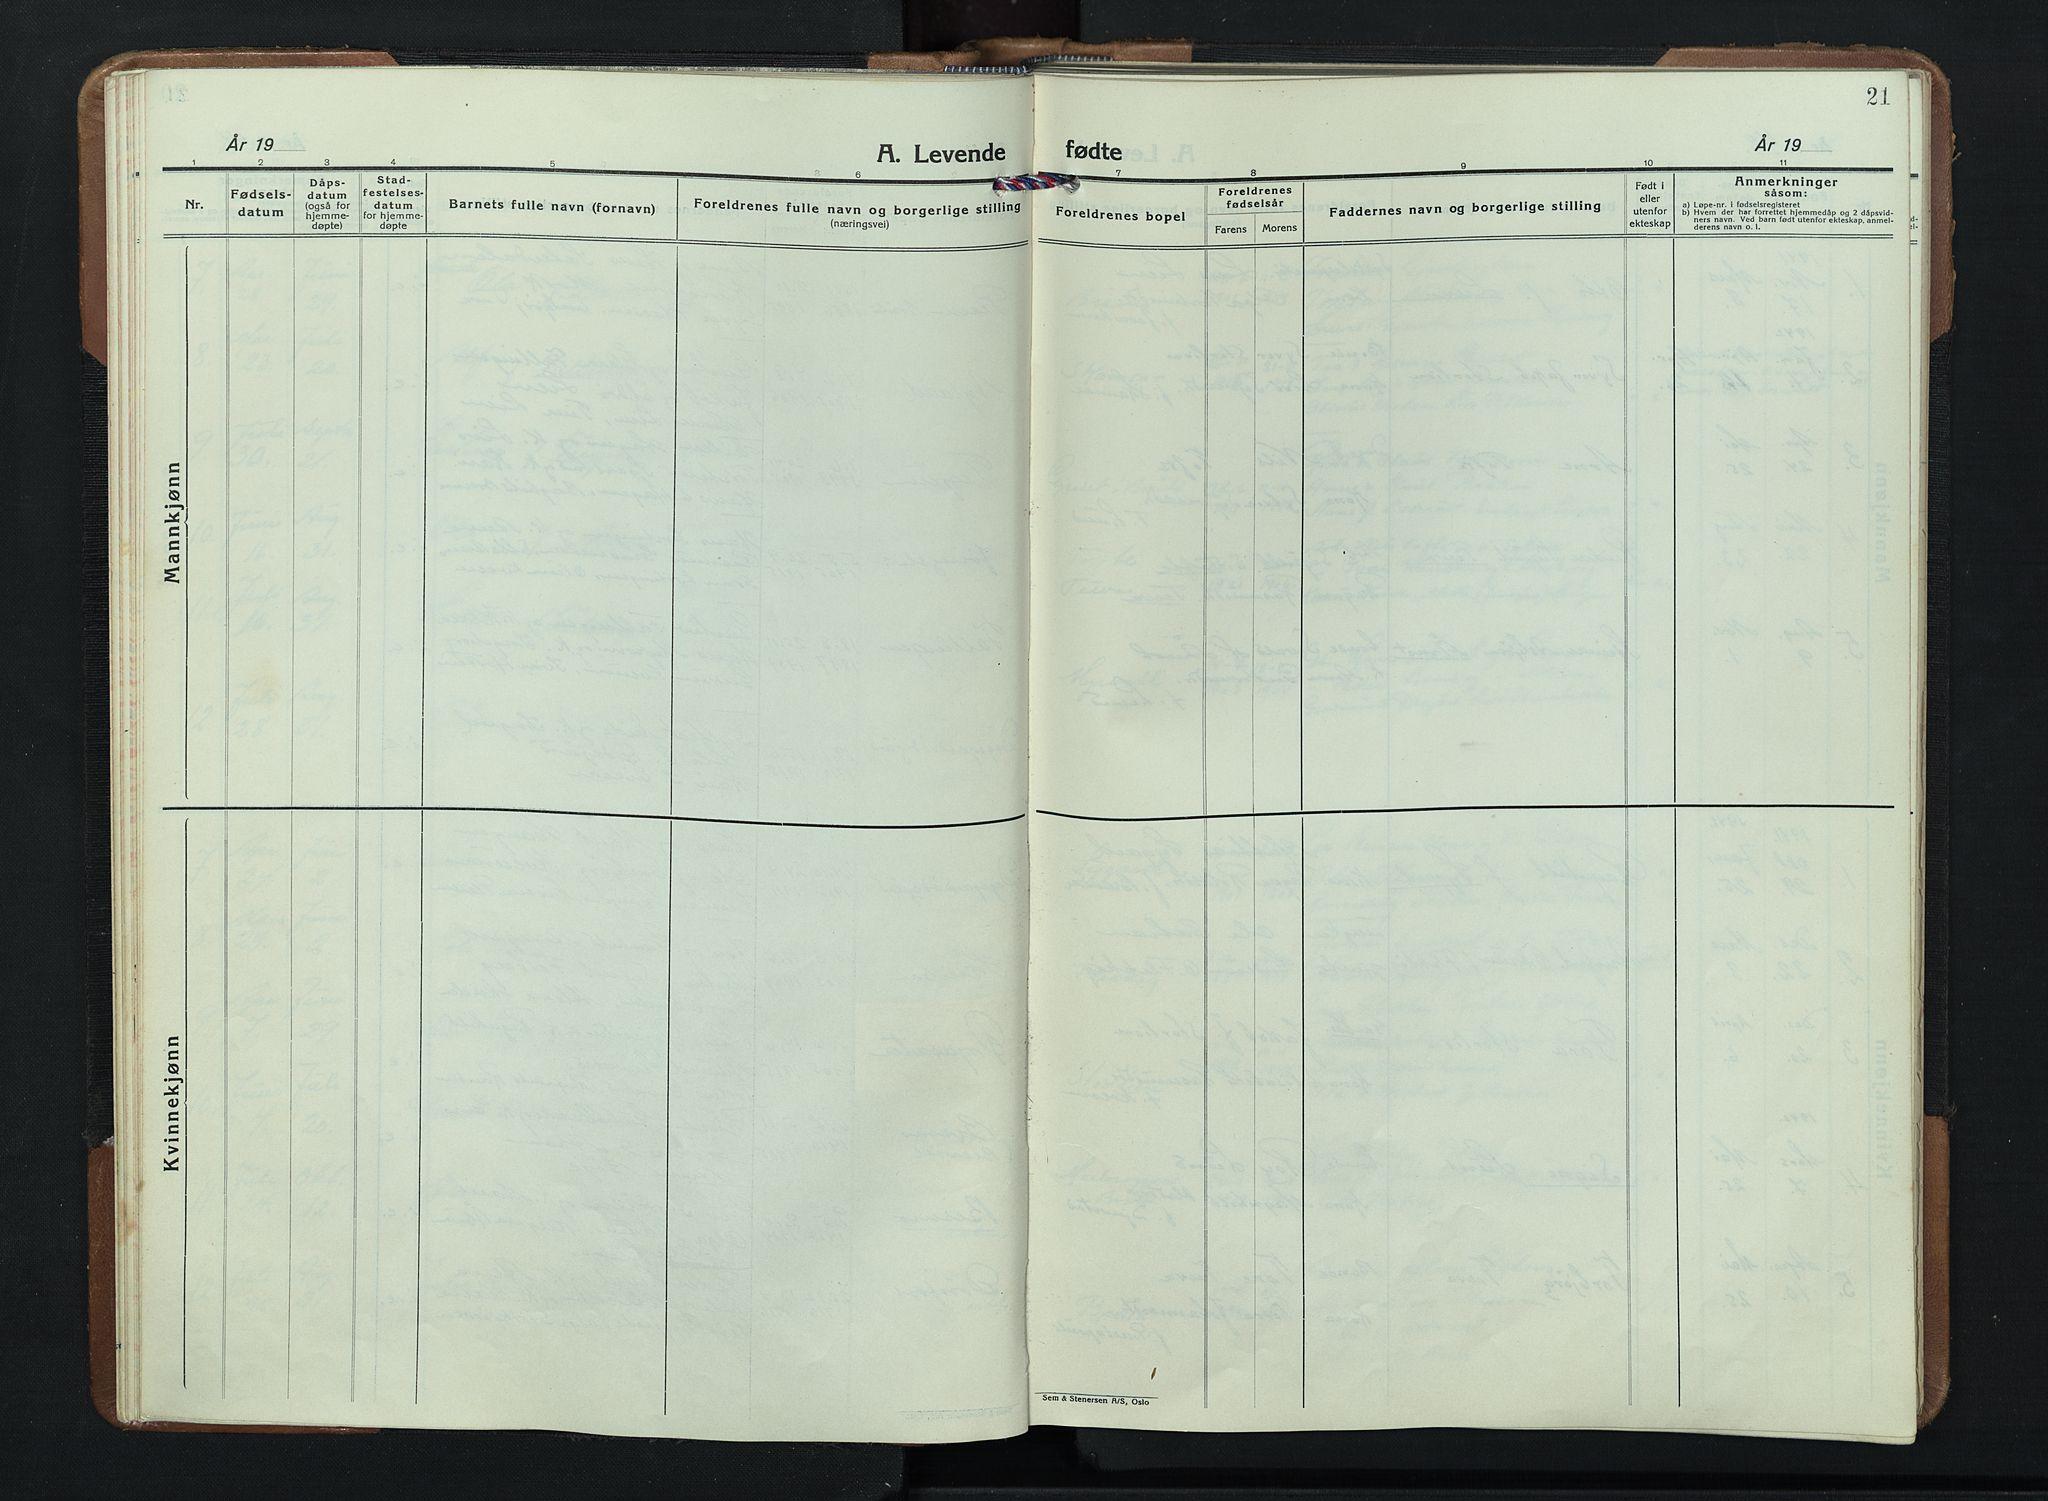 SAH, Skjåk prestekontor, Klokkerbok nr. 7, 1936-1958, s. 21